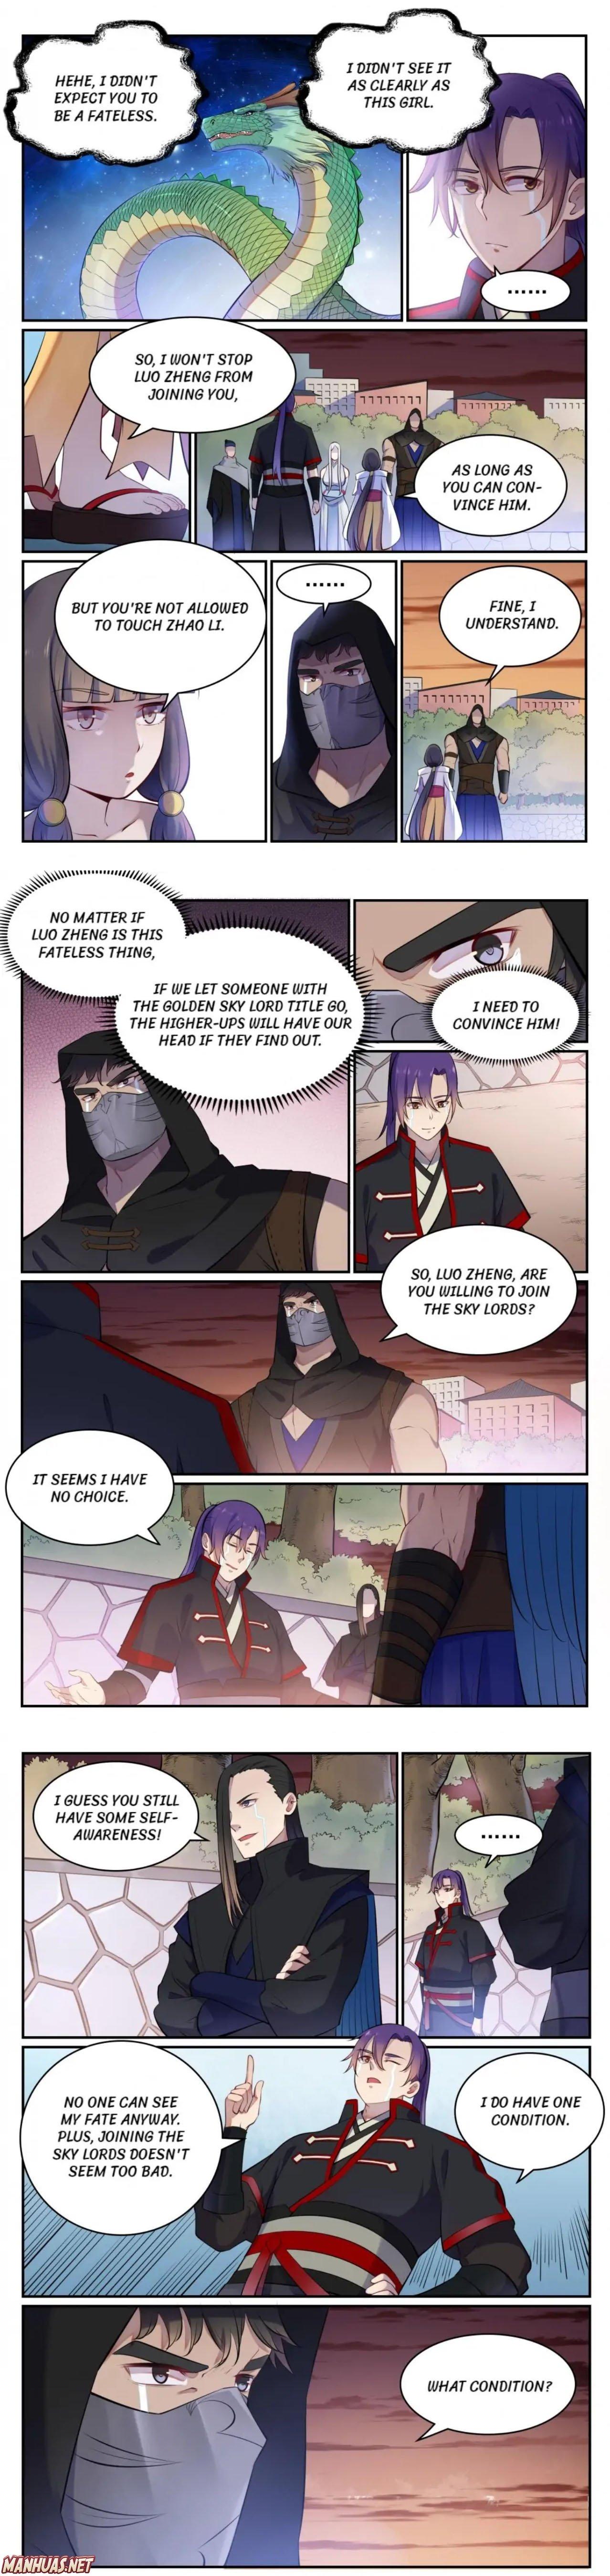 Manga Apotheosis - Chapter 471 Page 5